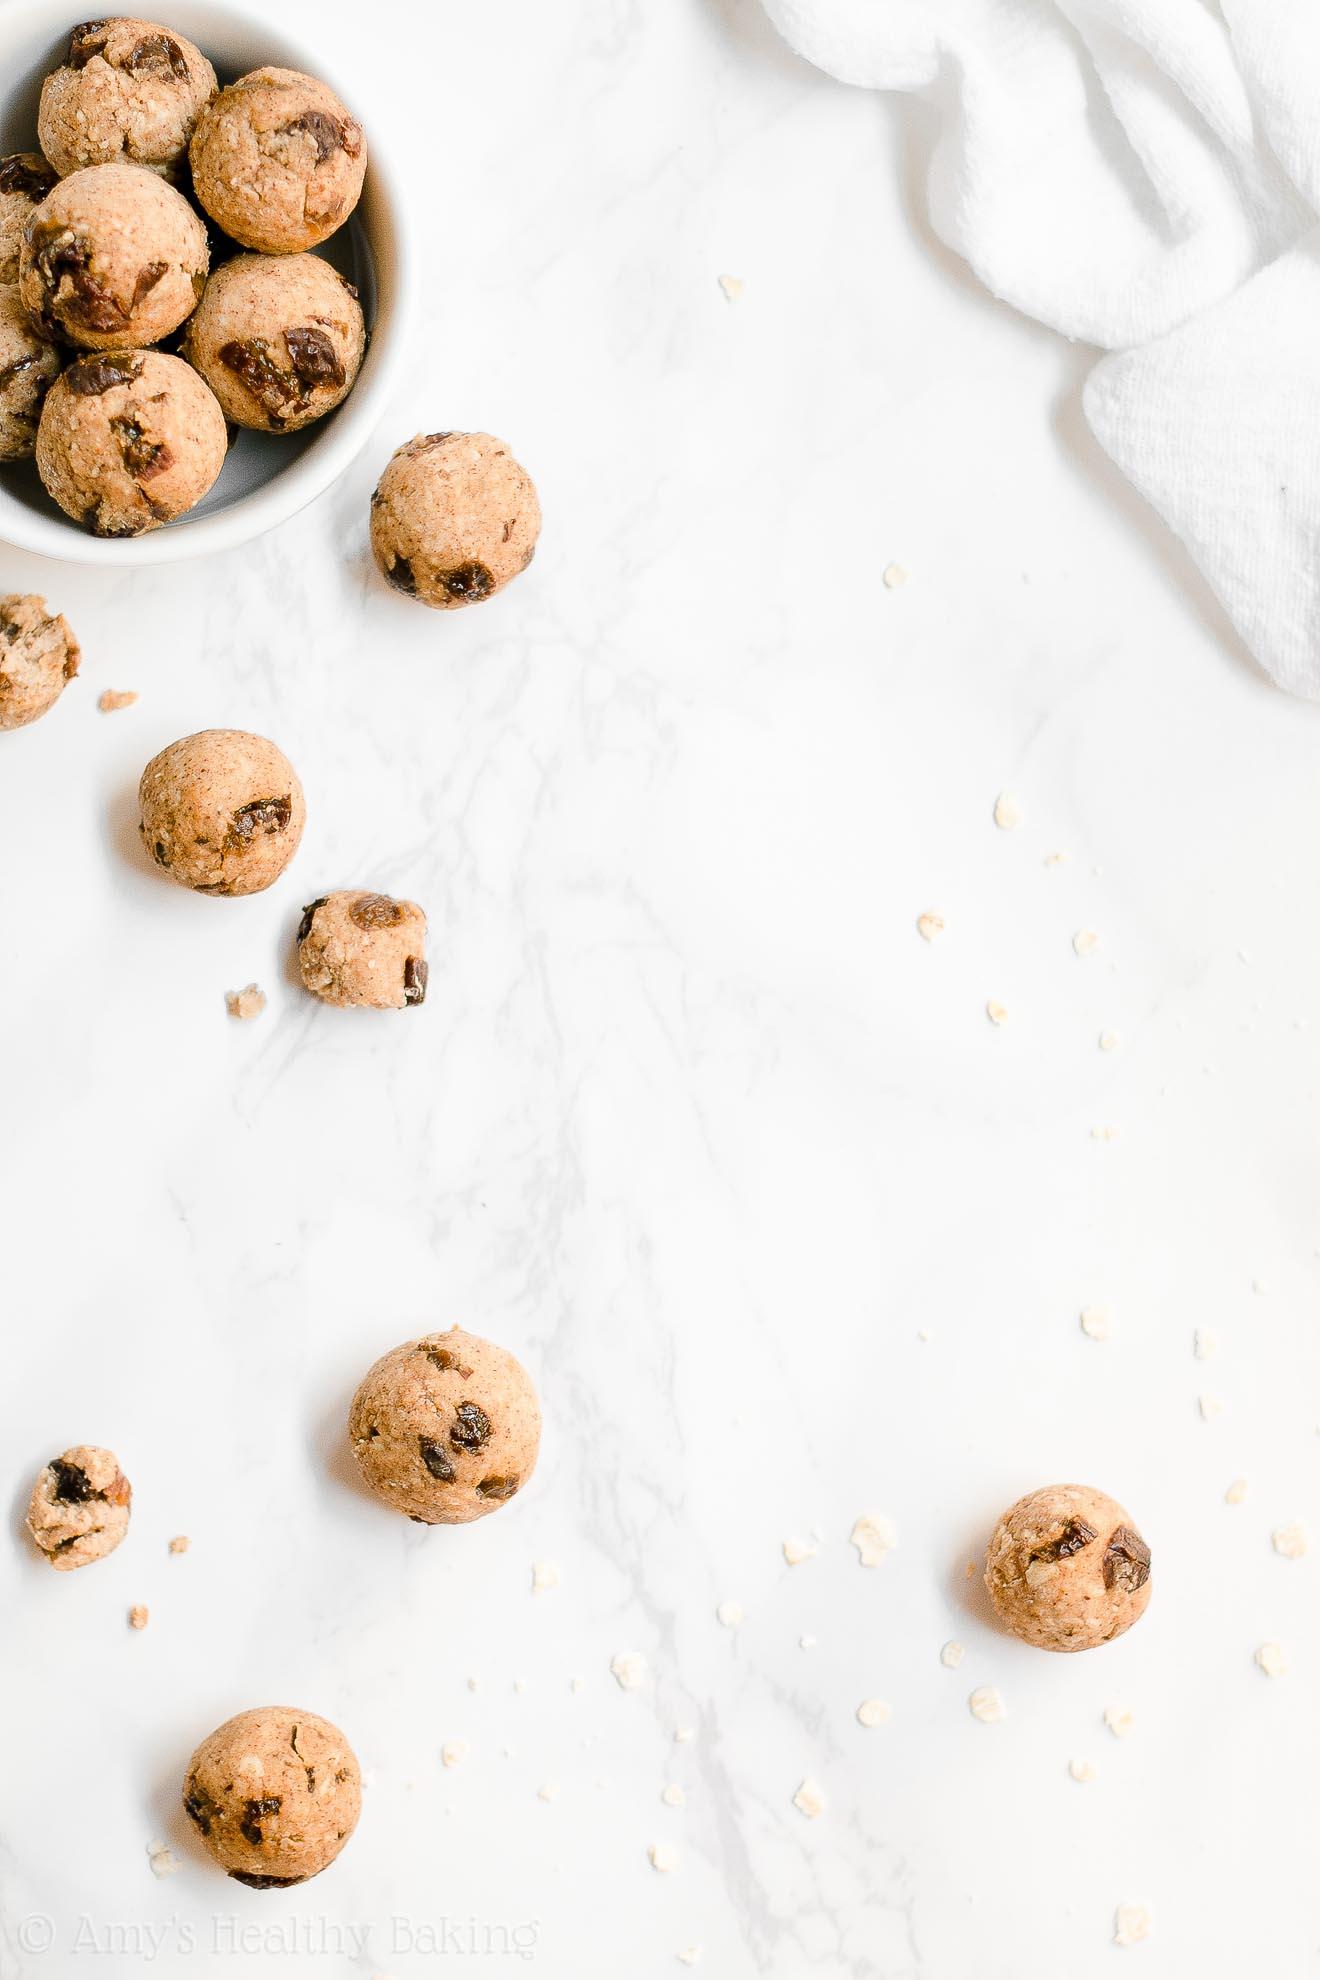 Clean Eating Eggless Flourless Sugar Free Oatmeal Raisin Cookie Dough Bites